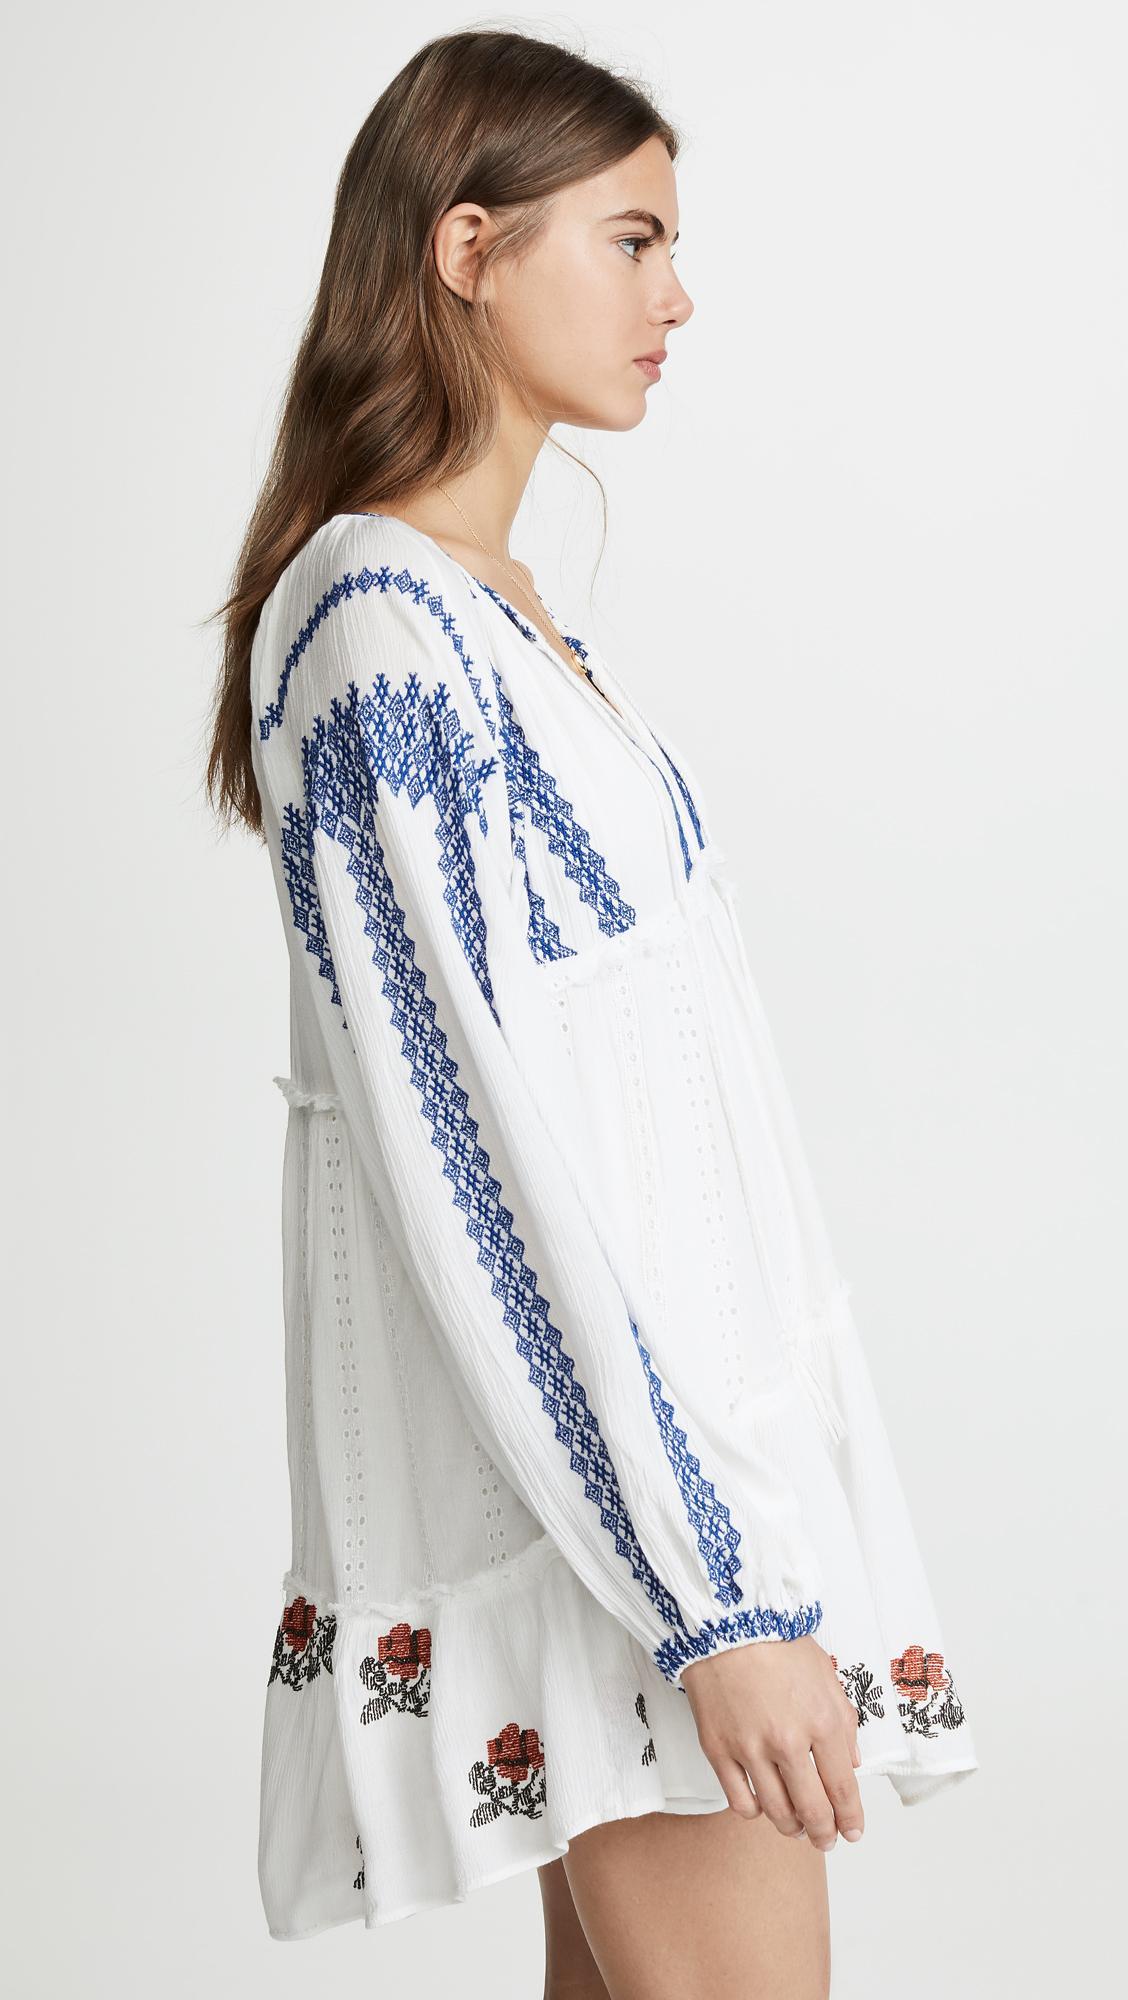 20c5217186d67 Free People Wild Horses Mini Dress in White - Lyst